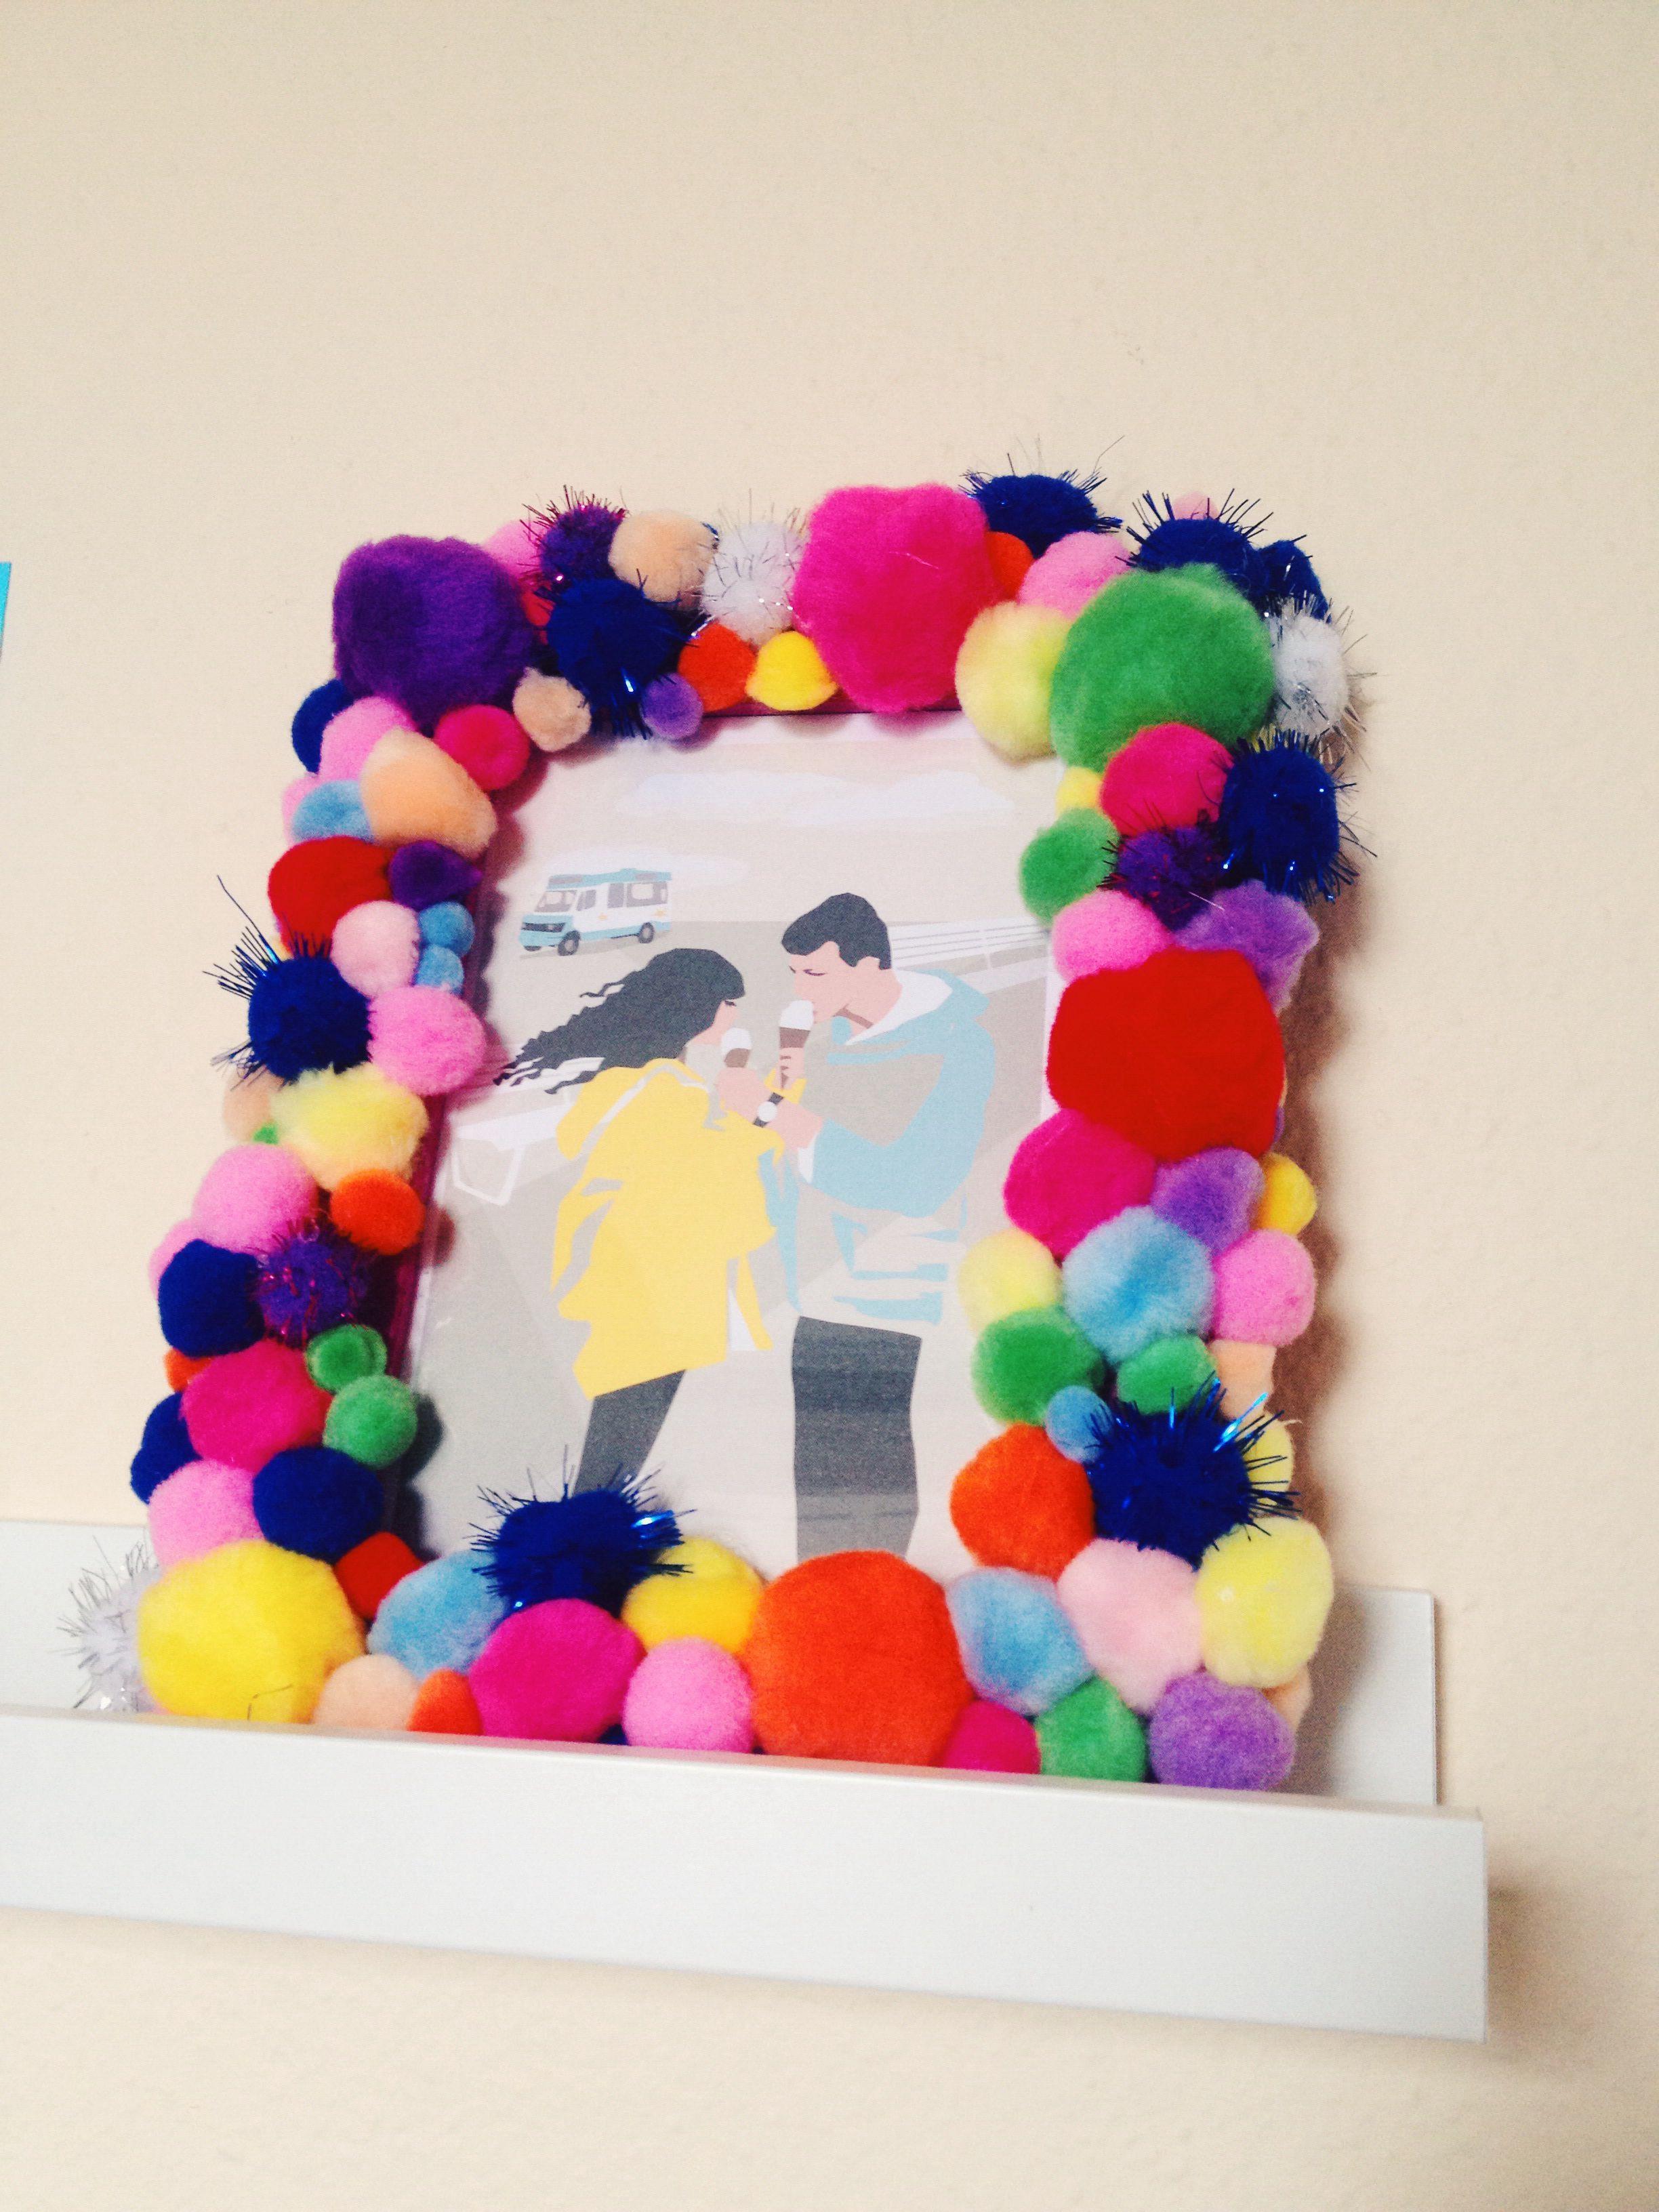 DIY Pom Pom picture frame | craft | Pinterest | Crafty and Craft